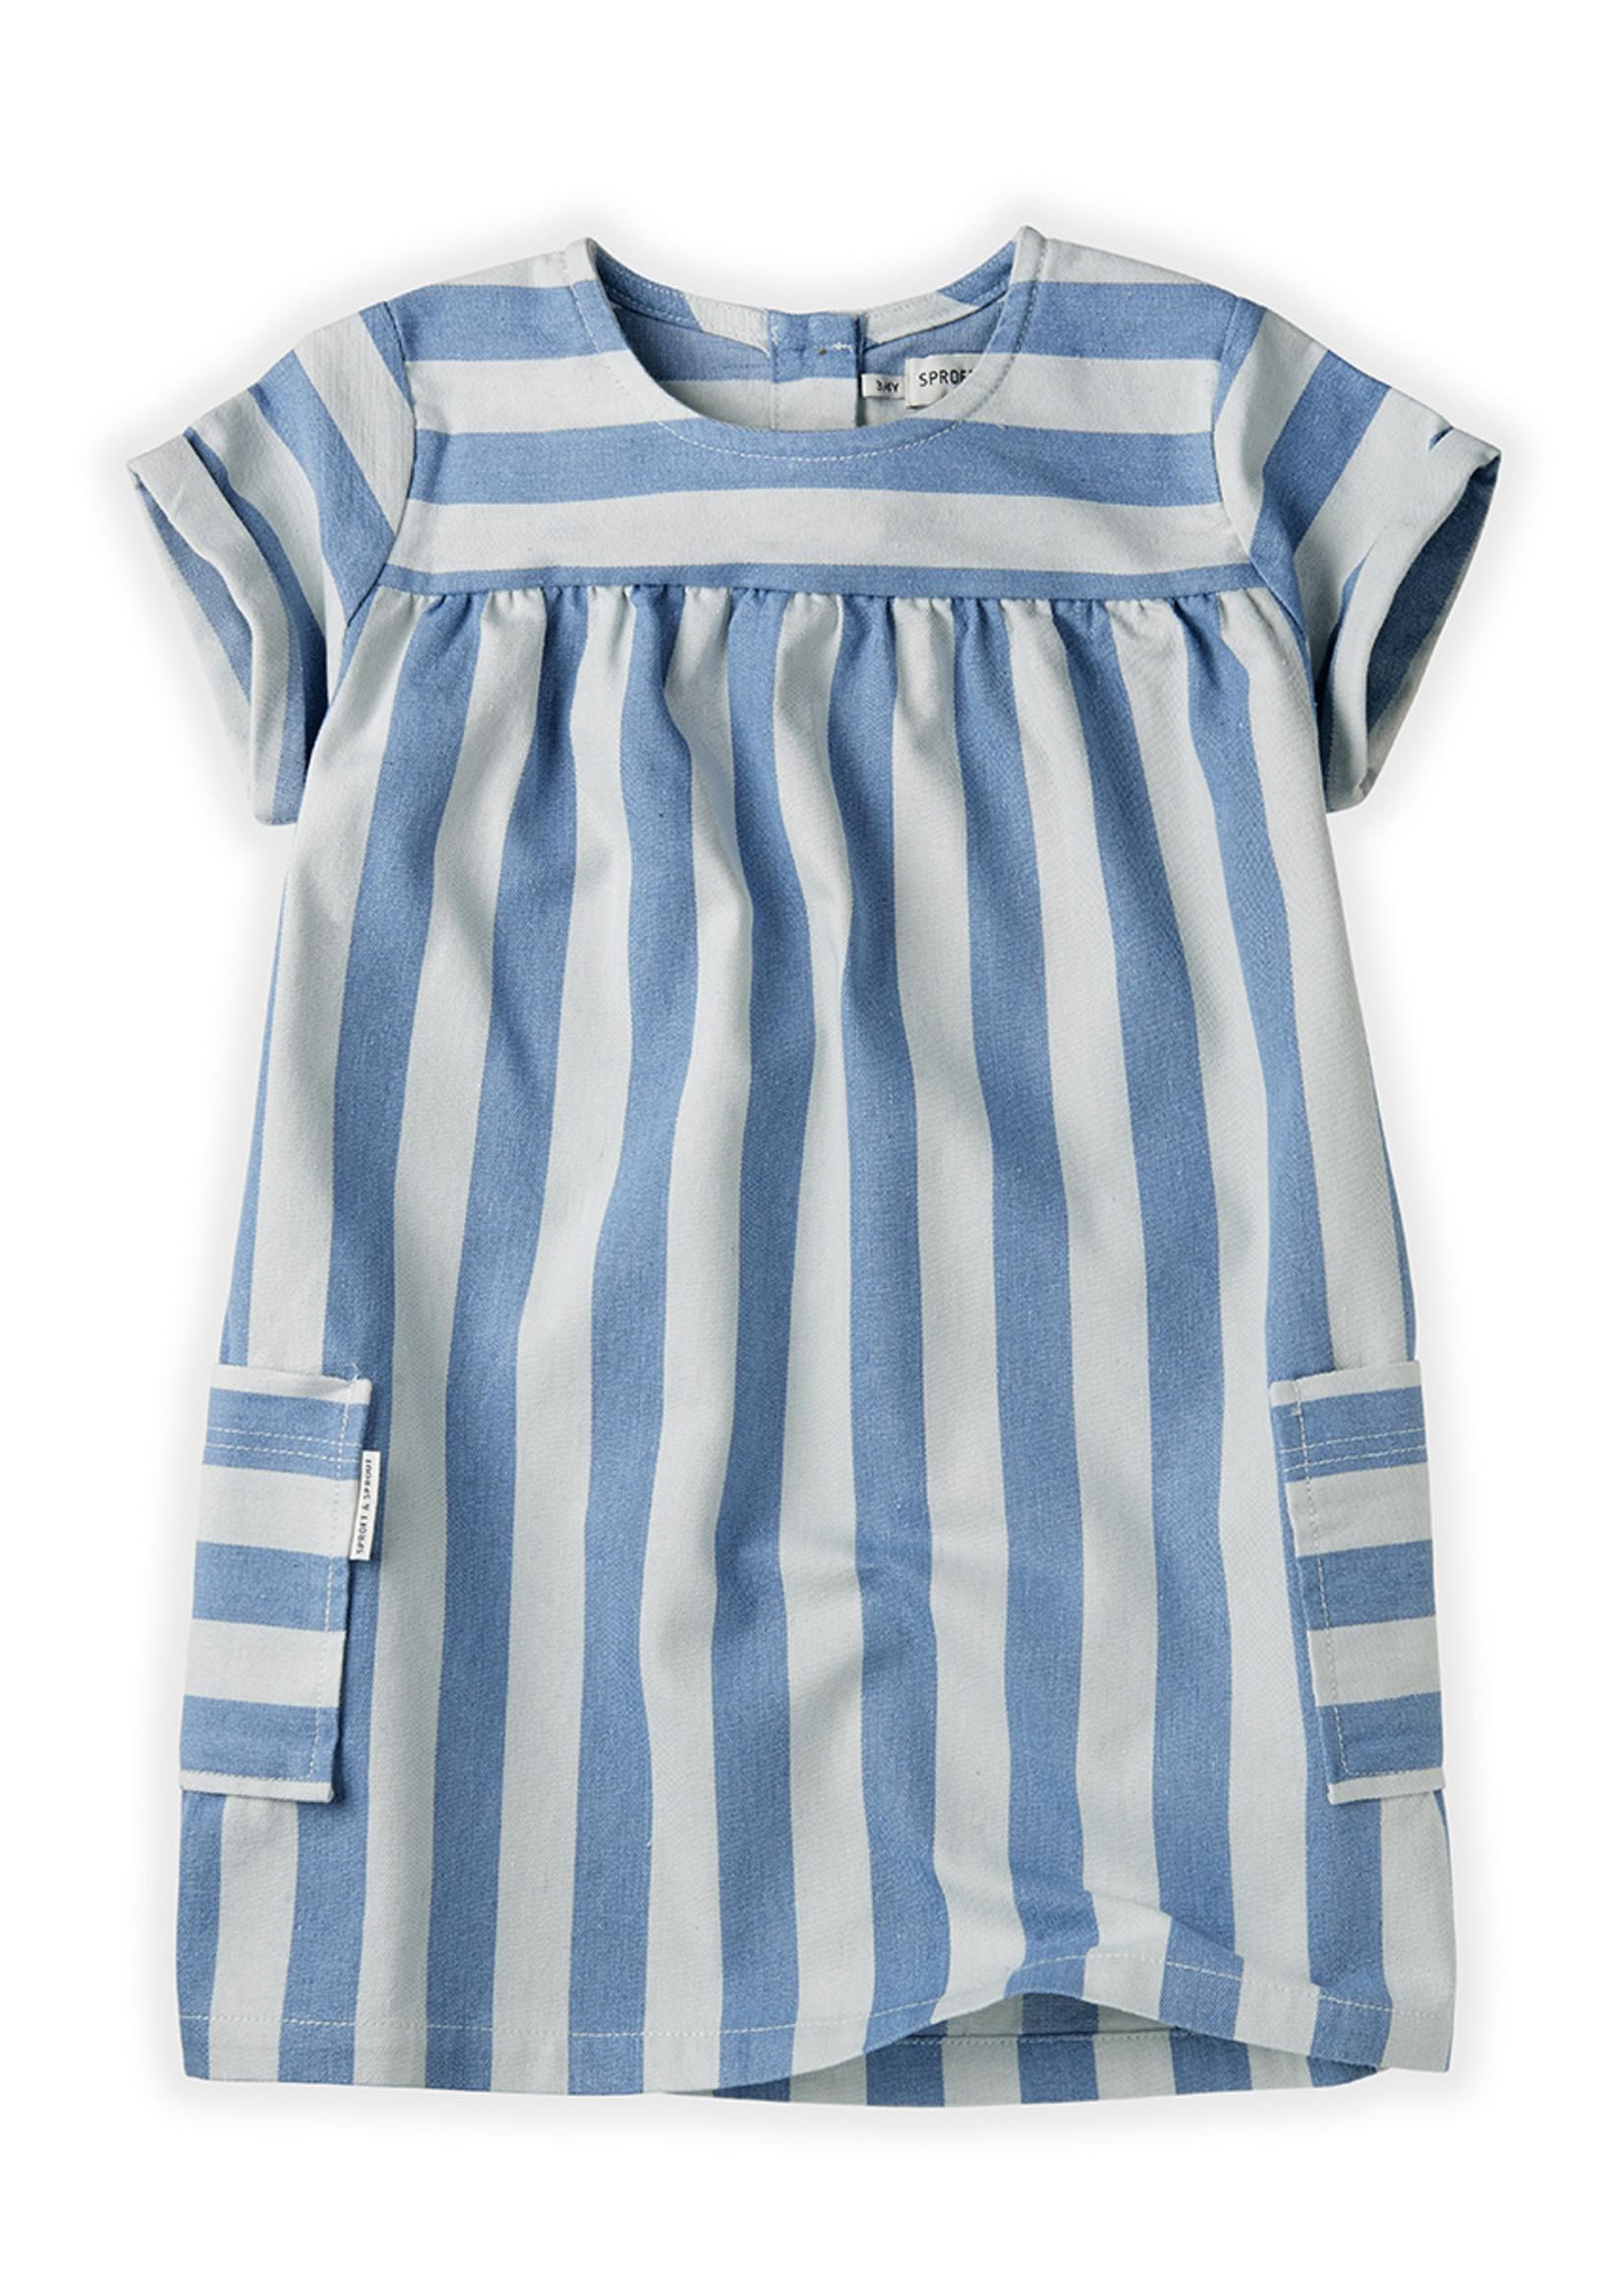 Sproet & Sprout SS - Dress Denim Stripe